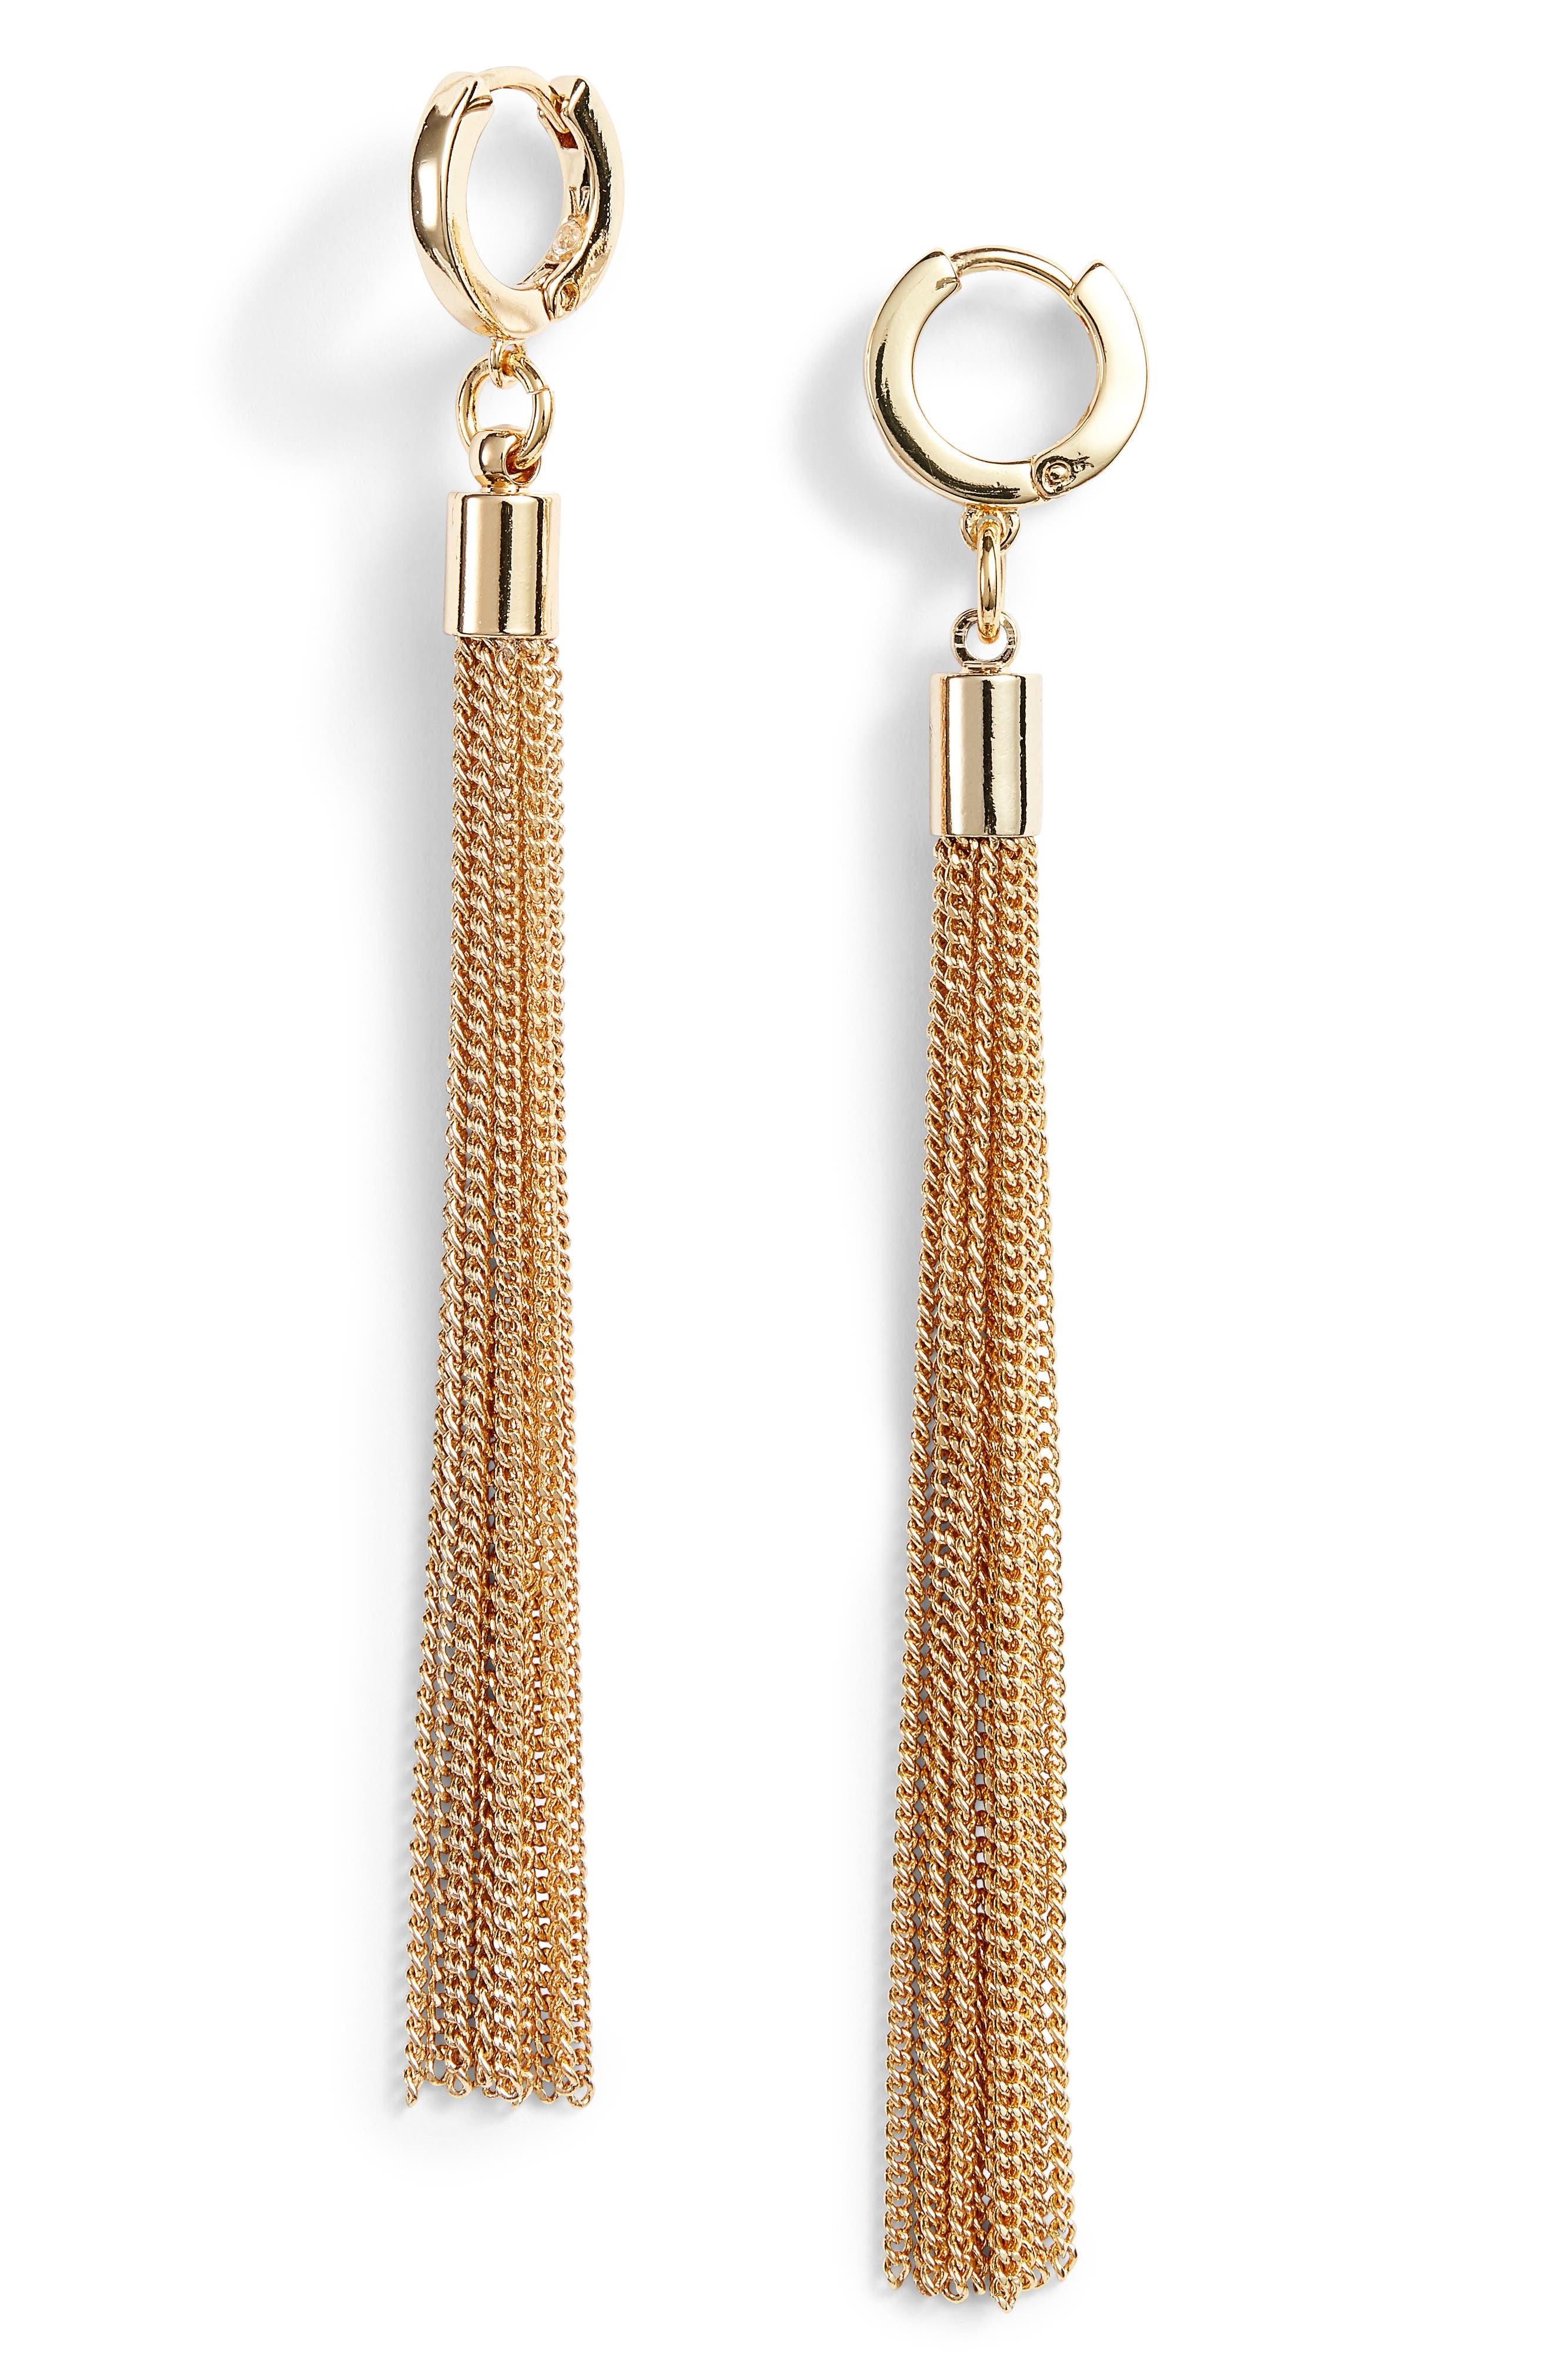 Vince Camuto Long Tassel Earrings